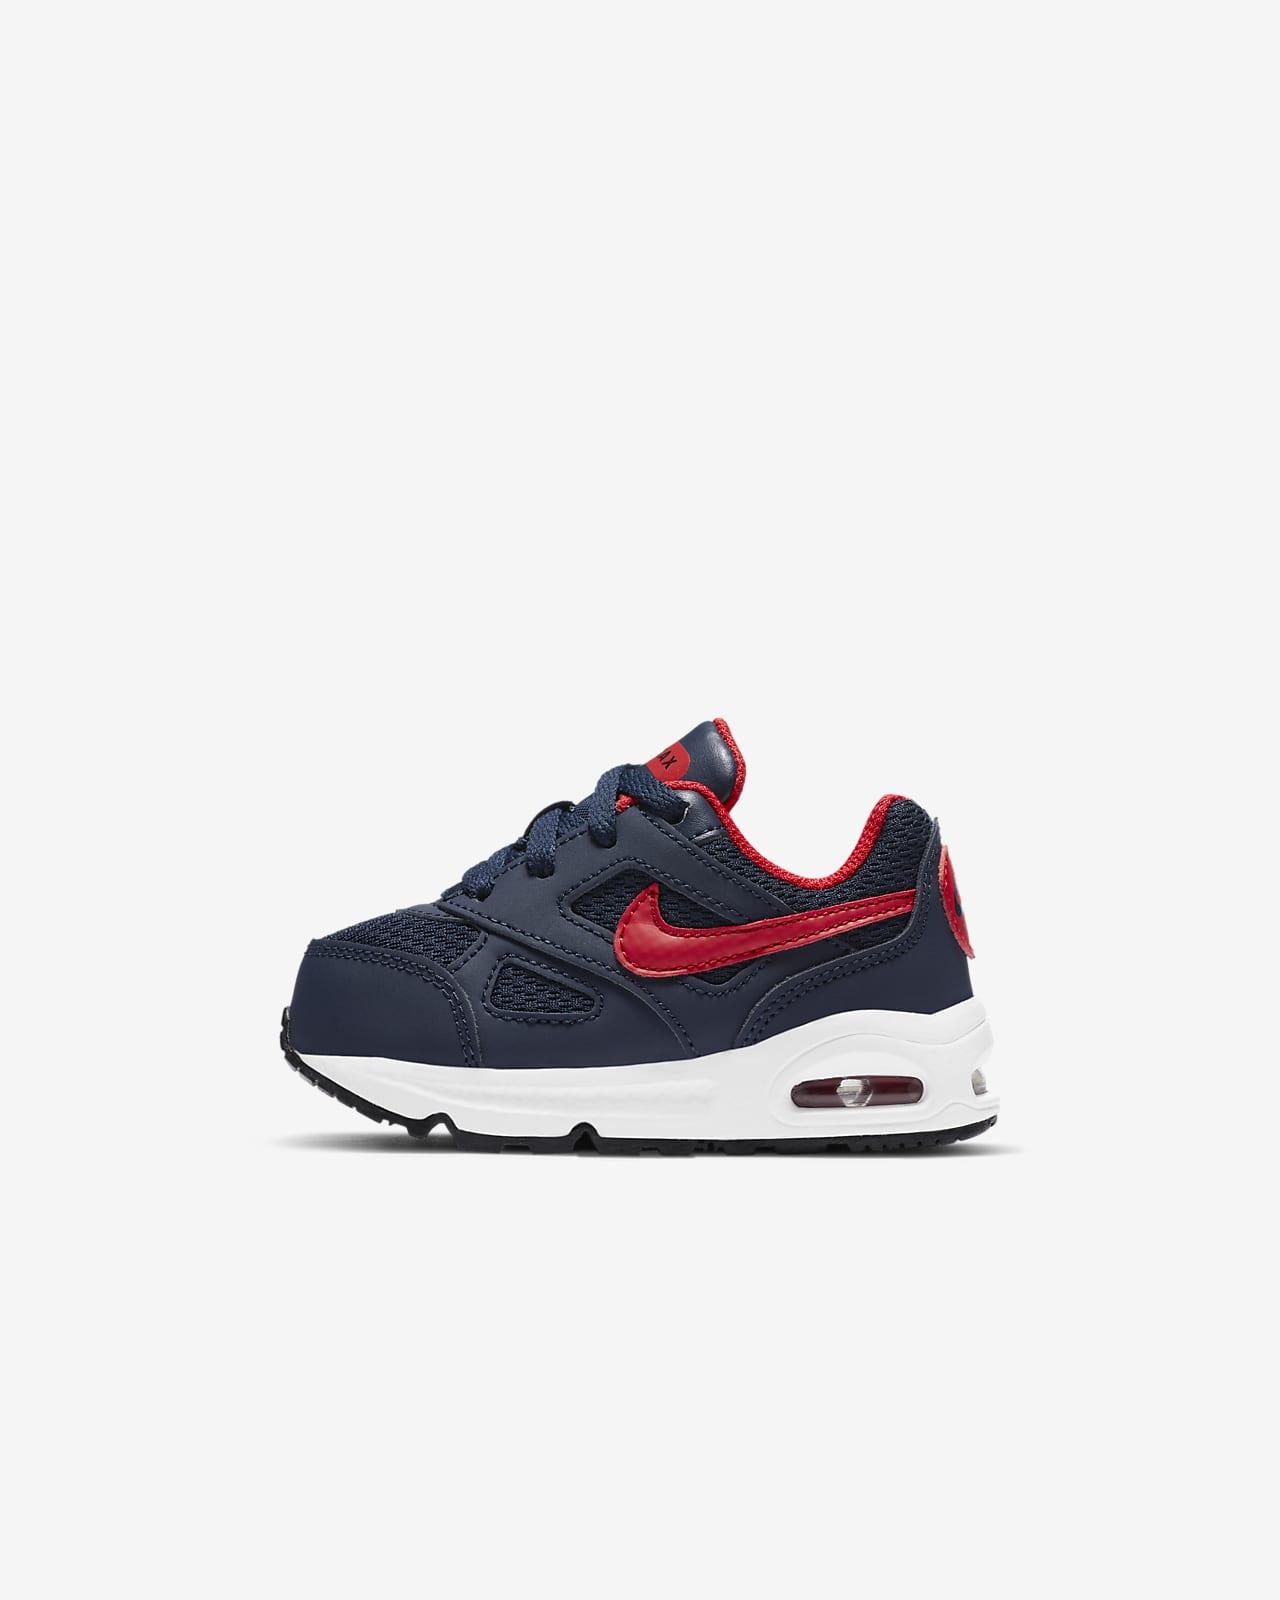 Nike Air Max IVO-sko til babyer/småbørn